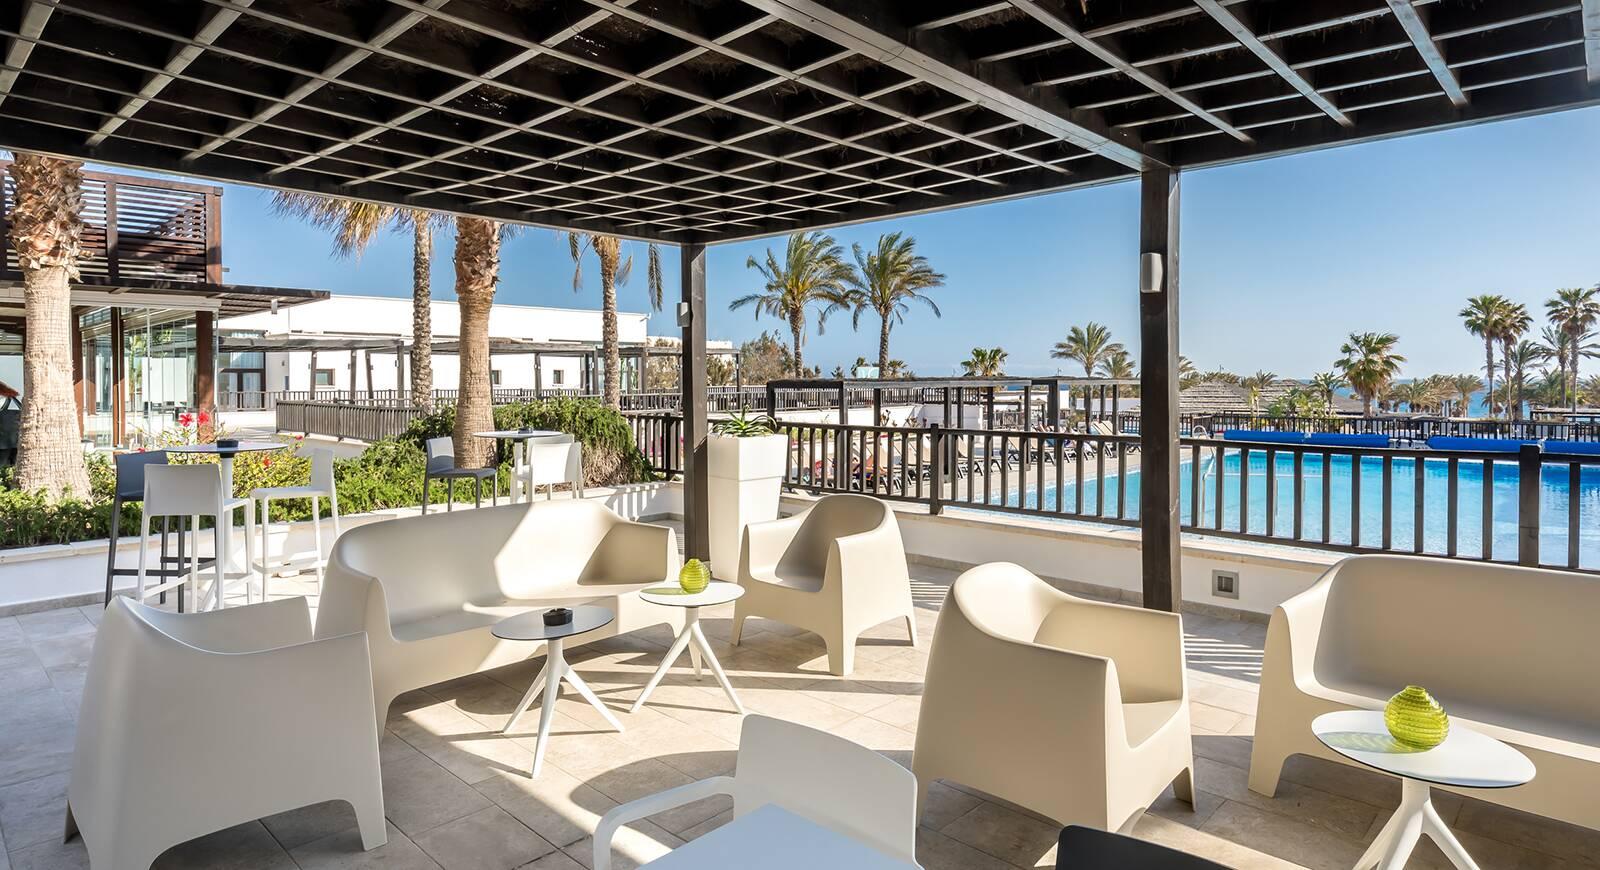 236-restaurant-131-hotel-barcelo-cabo-de-gata_tcm20-137240_w1600_h870_n.jpg